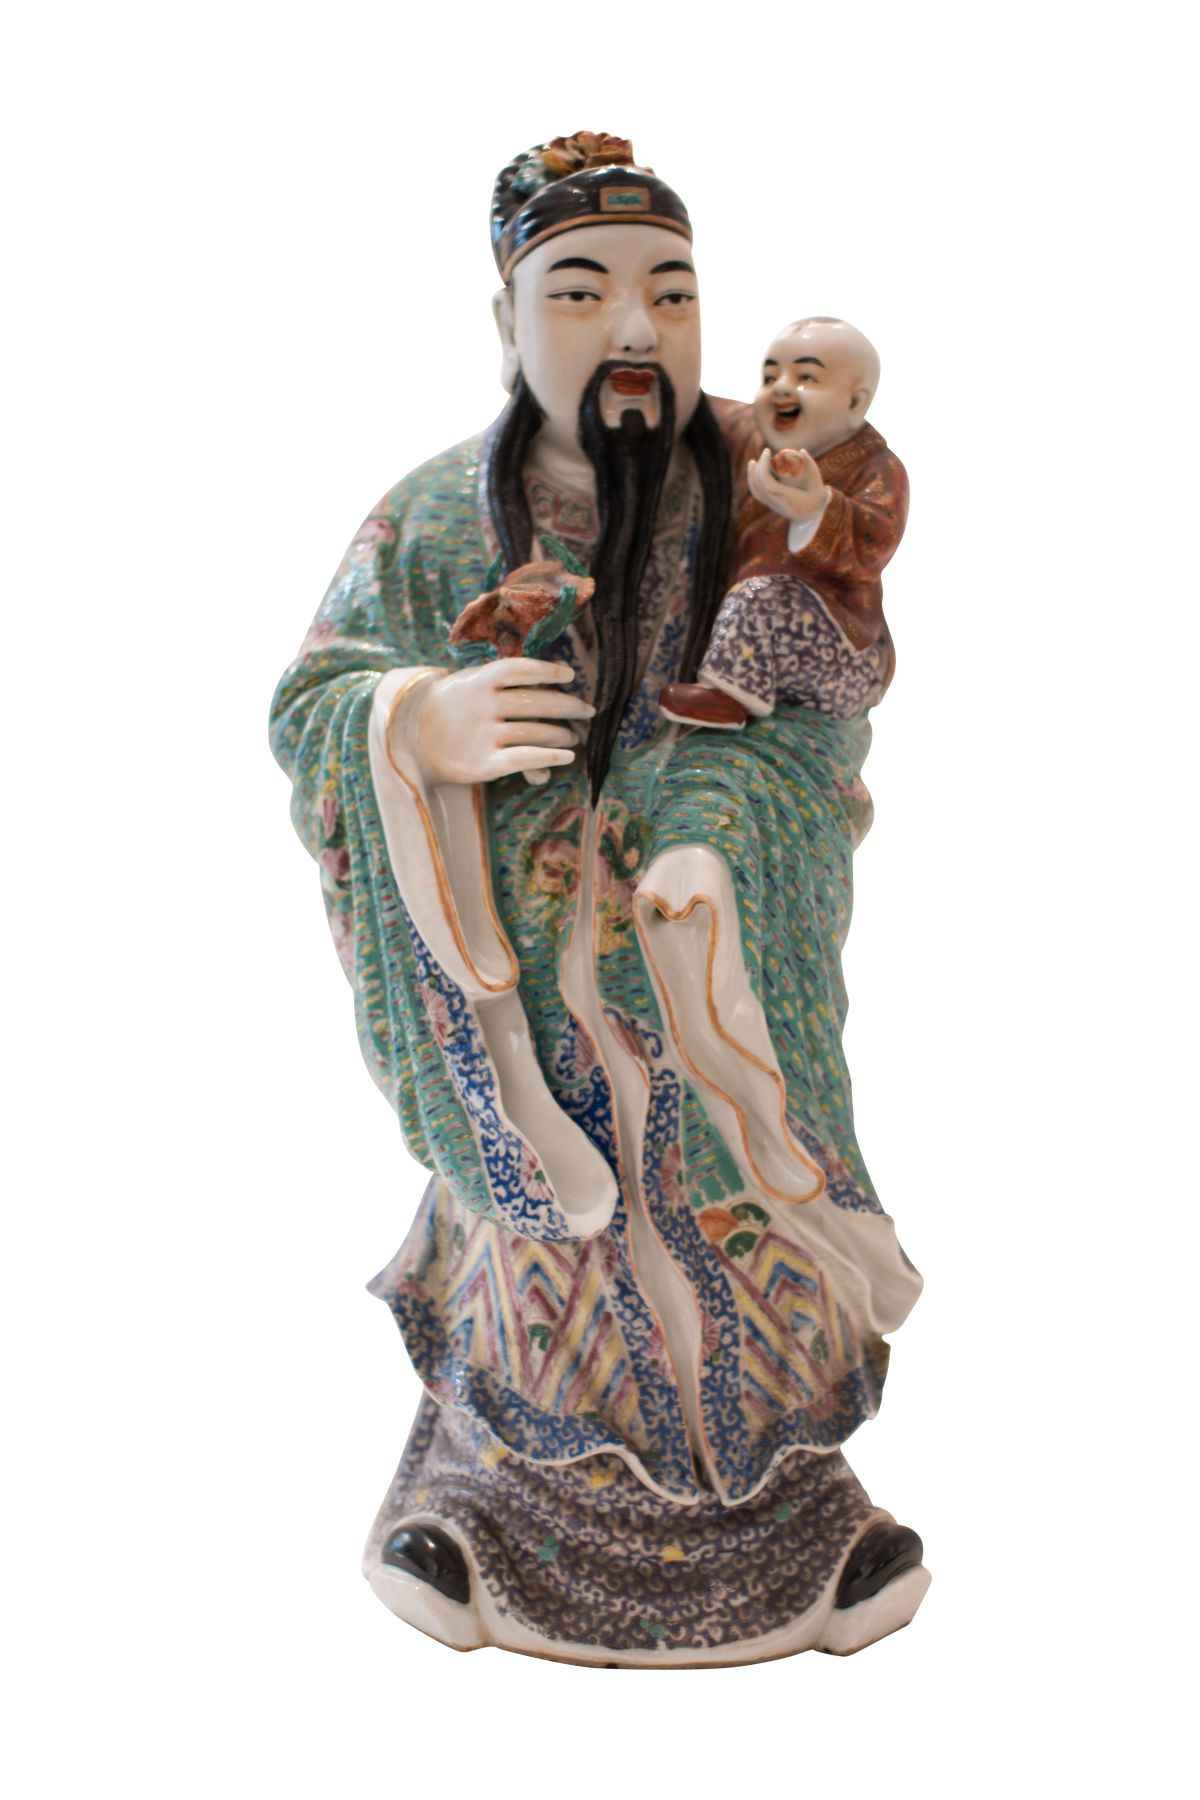 #199 Asian priest with child | Asiatischer Priester mit Kind Image